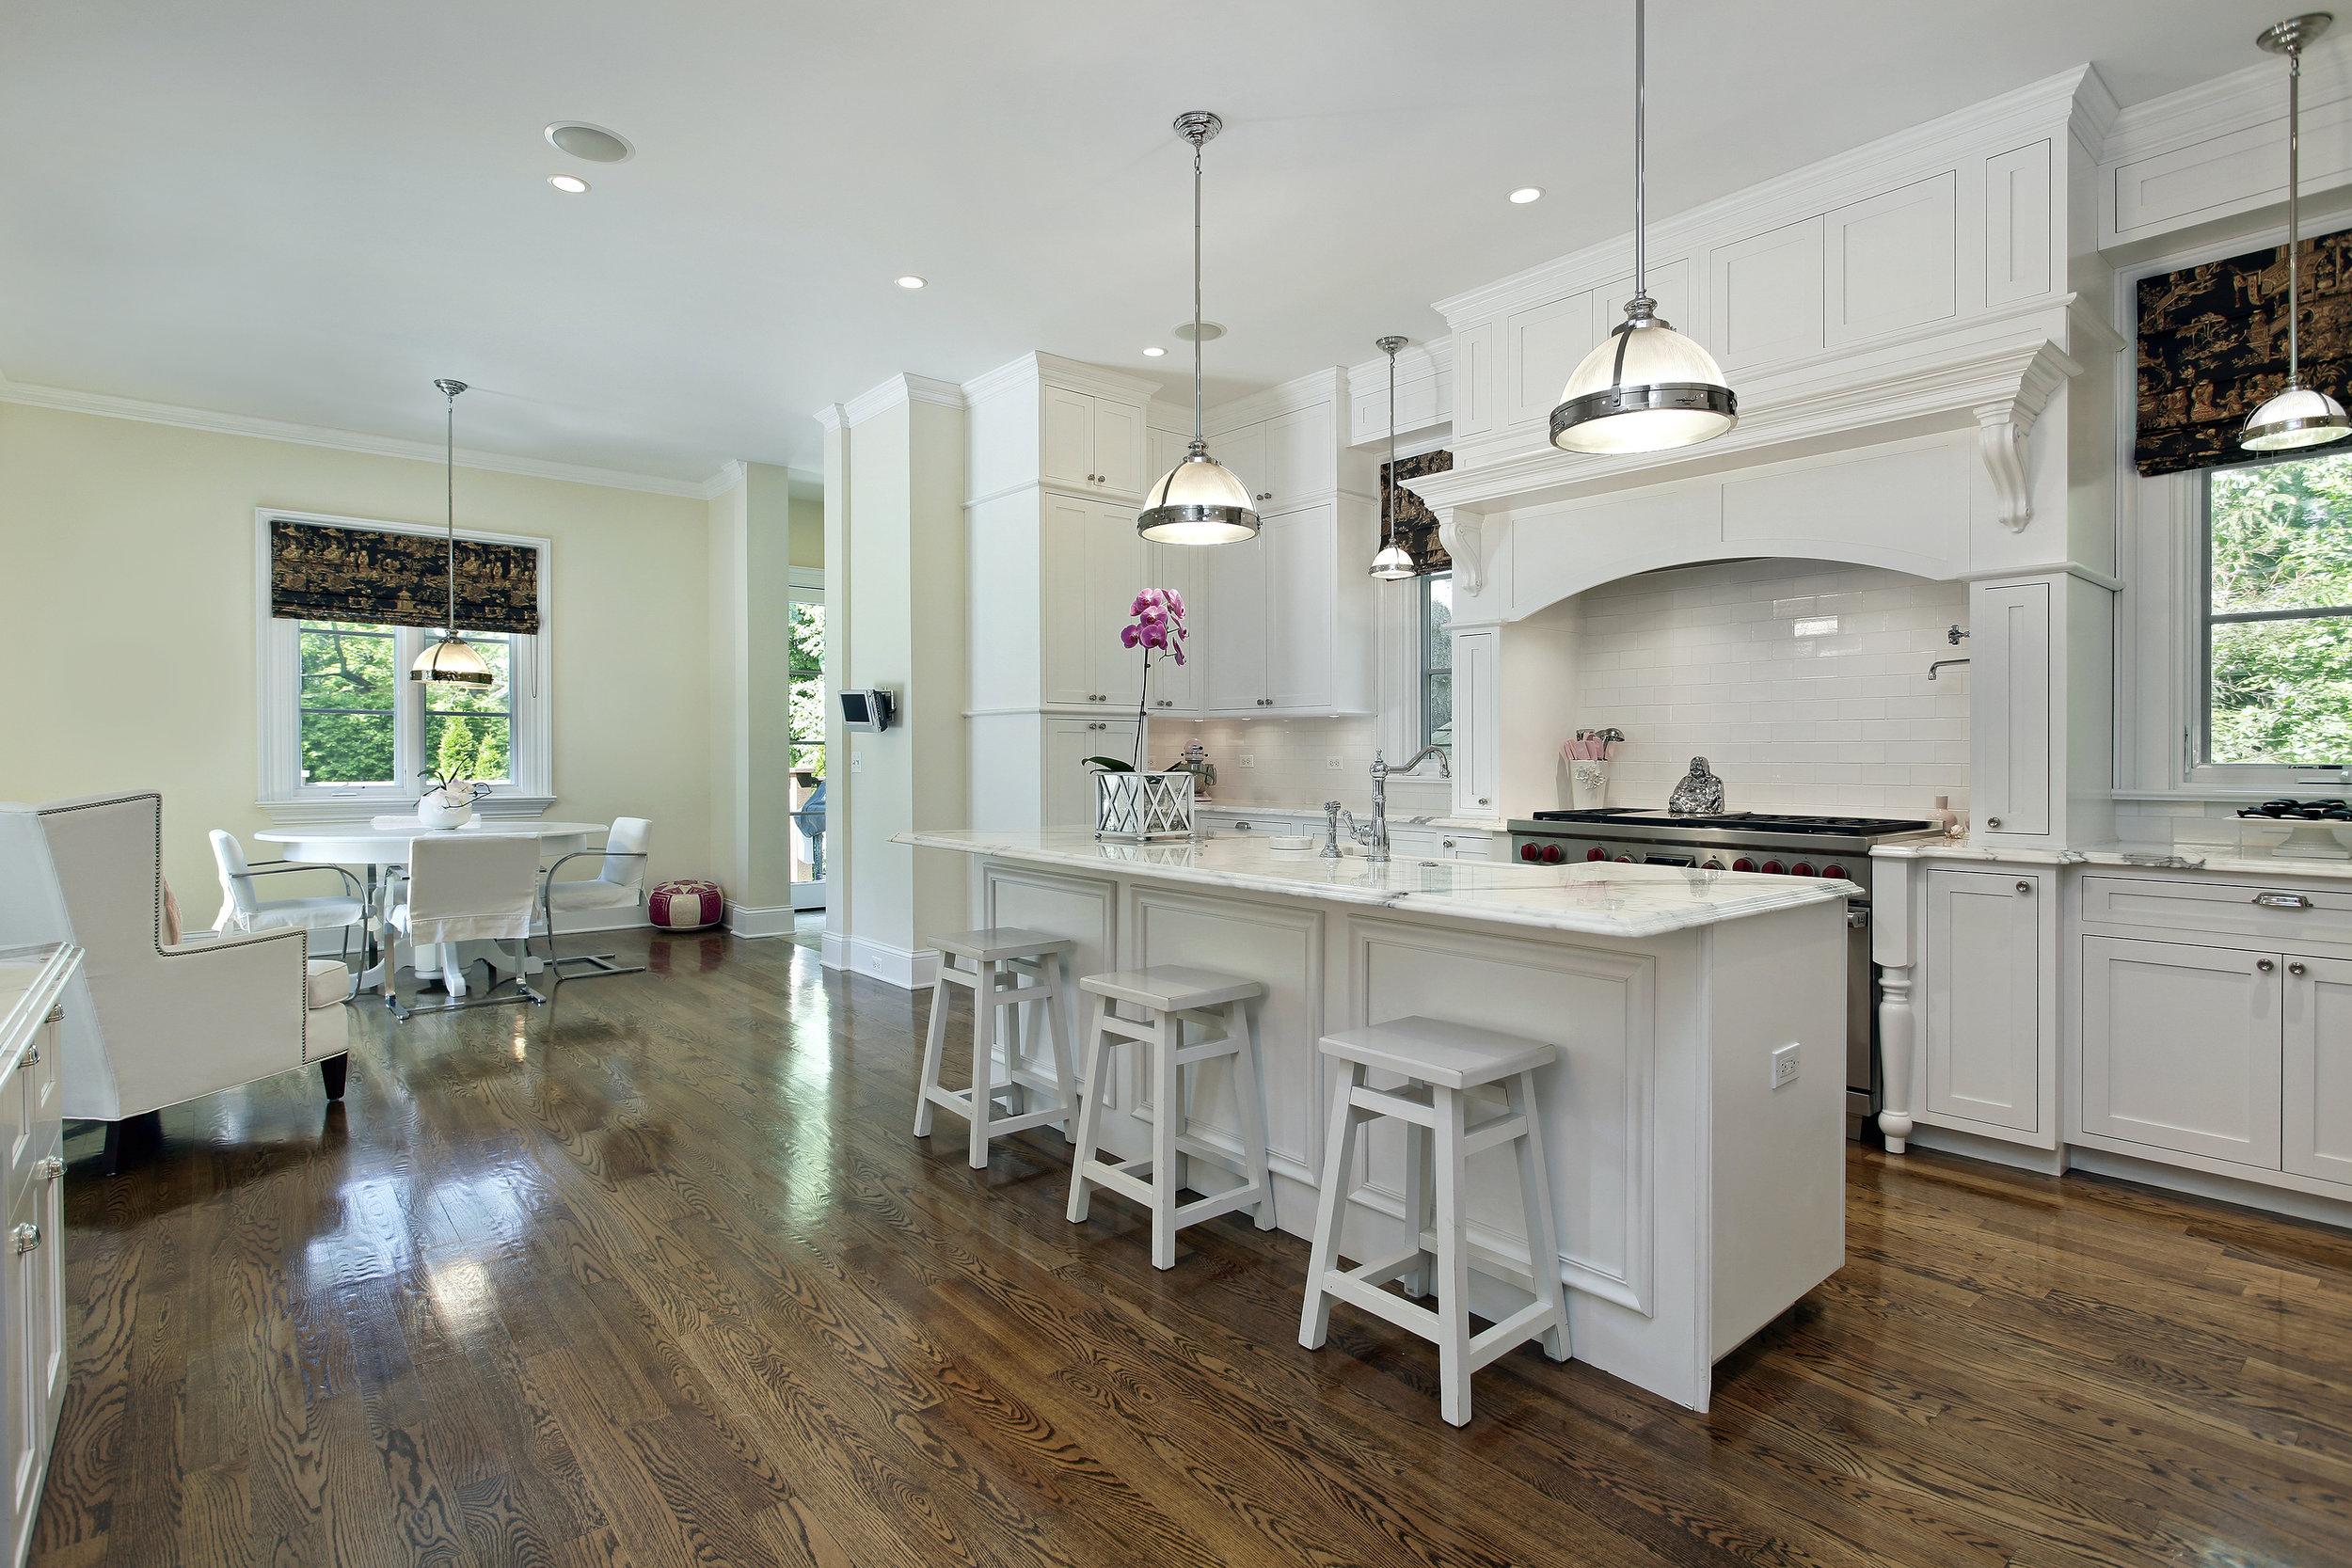 bigstock-Large-kitchen-in-luxury-home-w-75635452.jpg